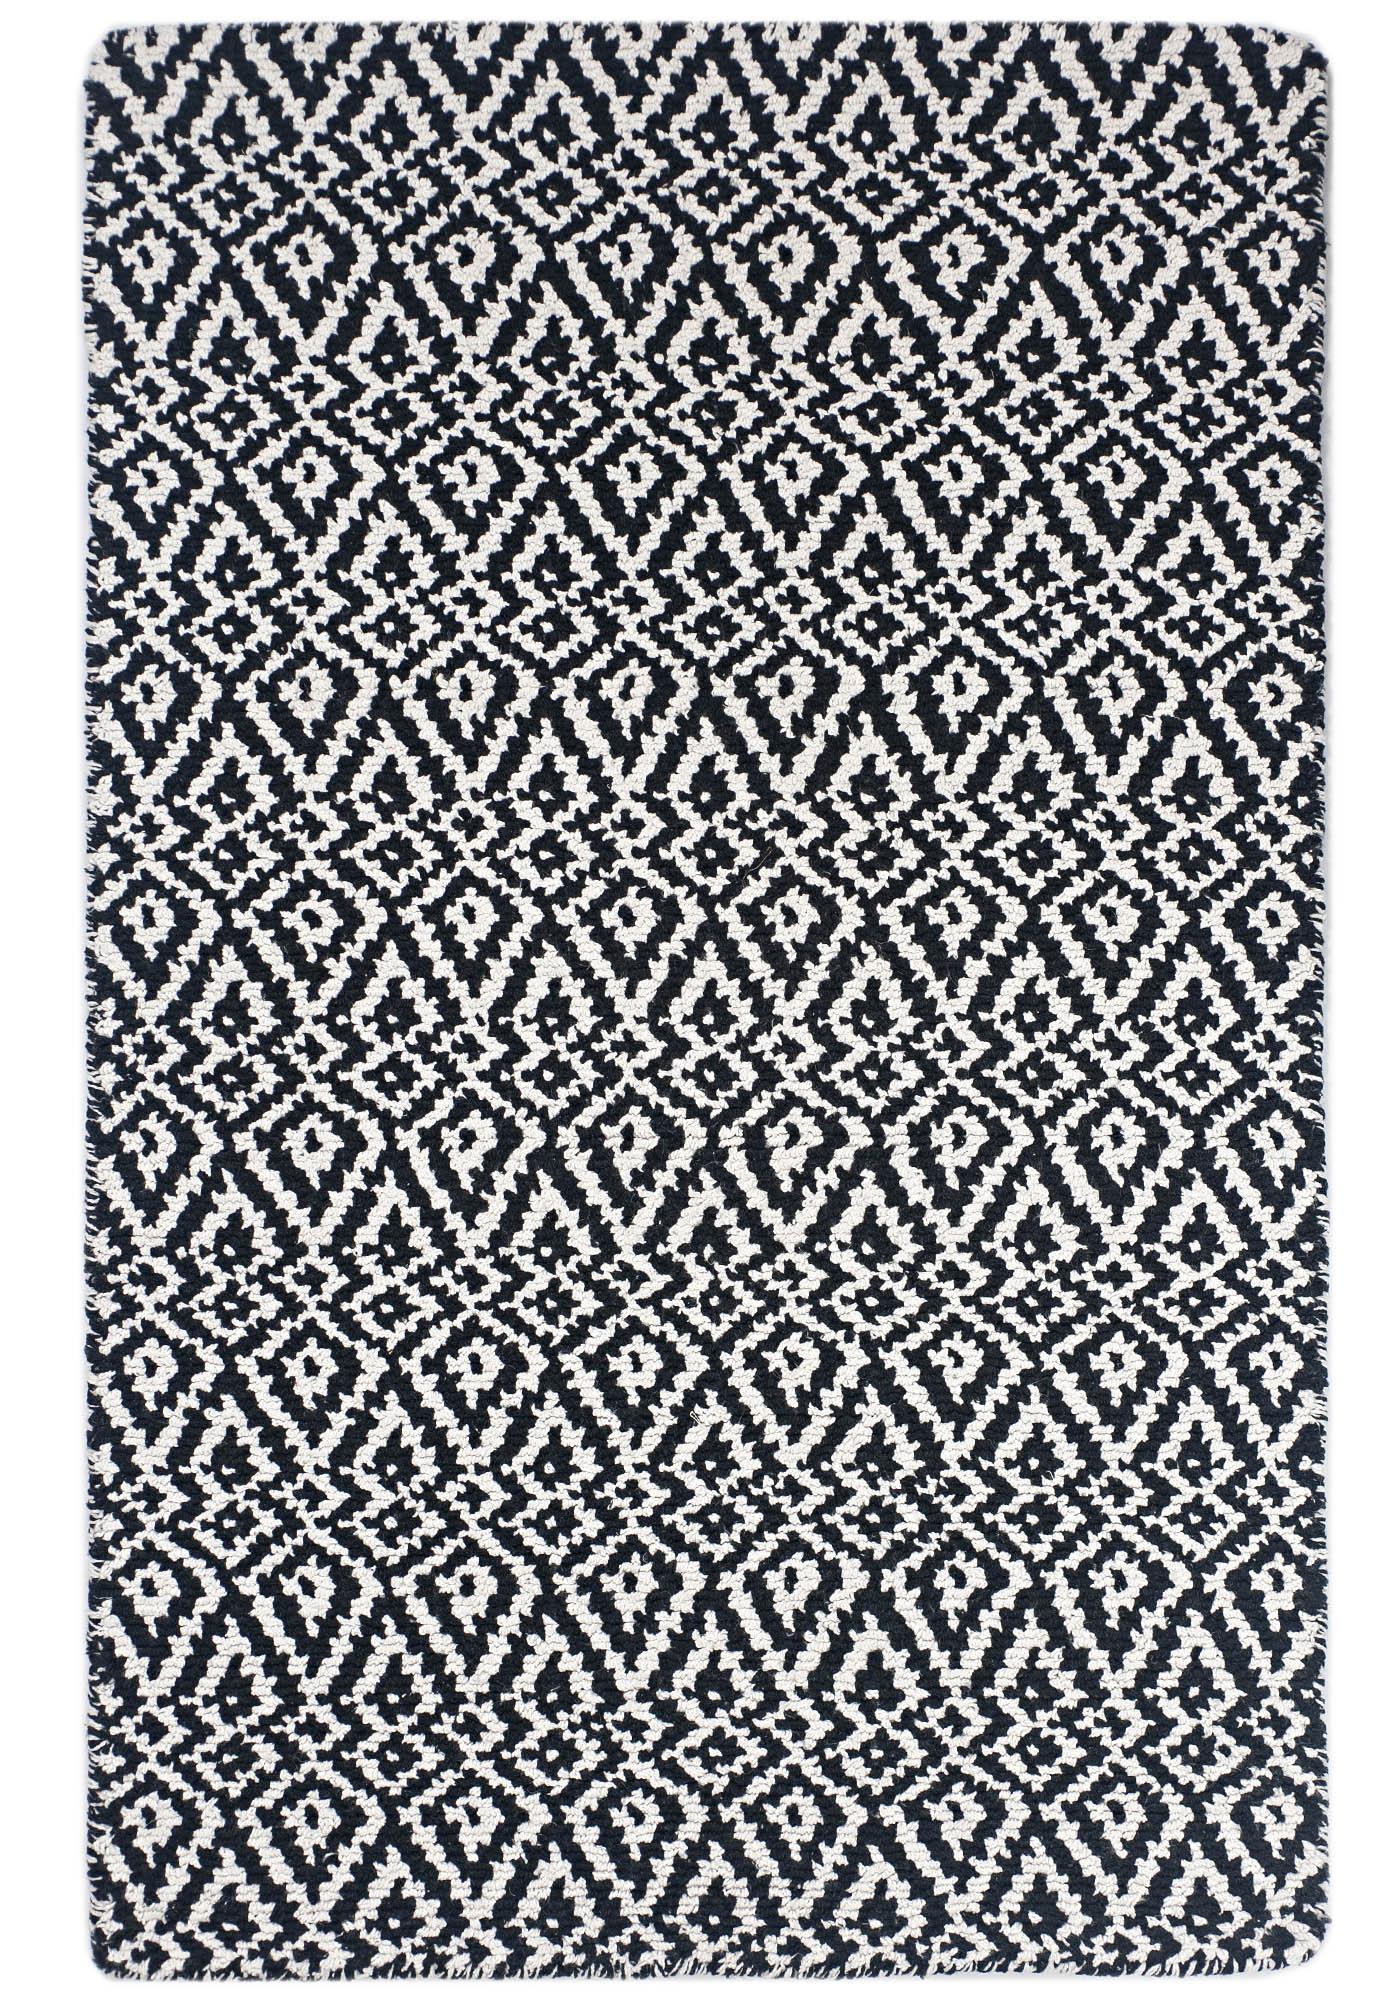 Oslo Black And White Eco Cotton Loom Hooked Rug Hook Loom